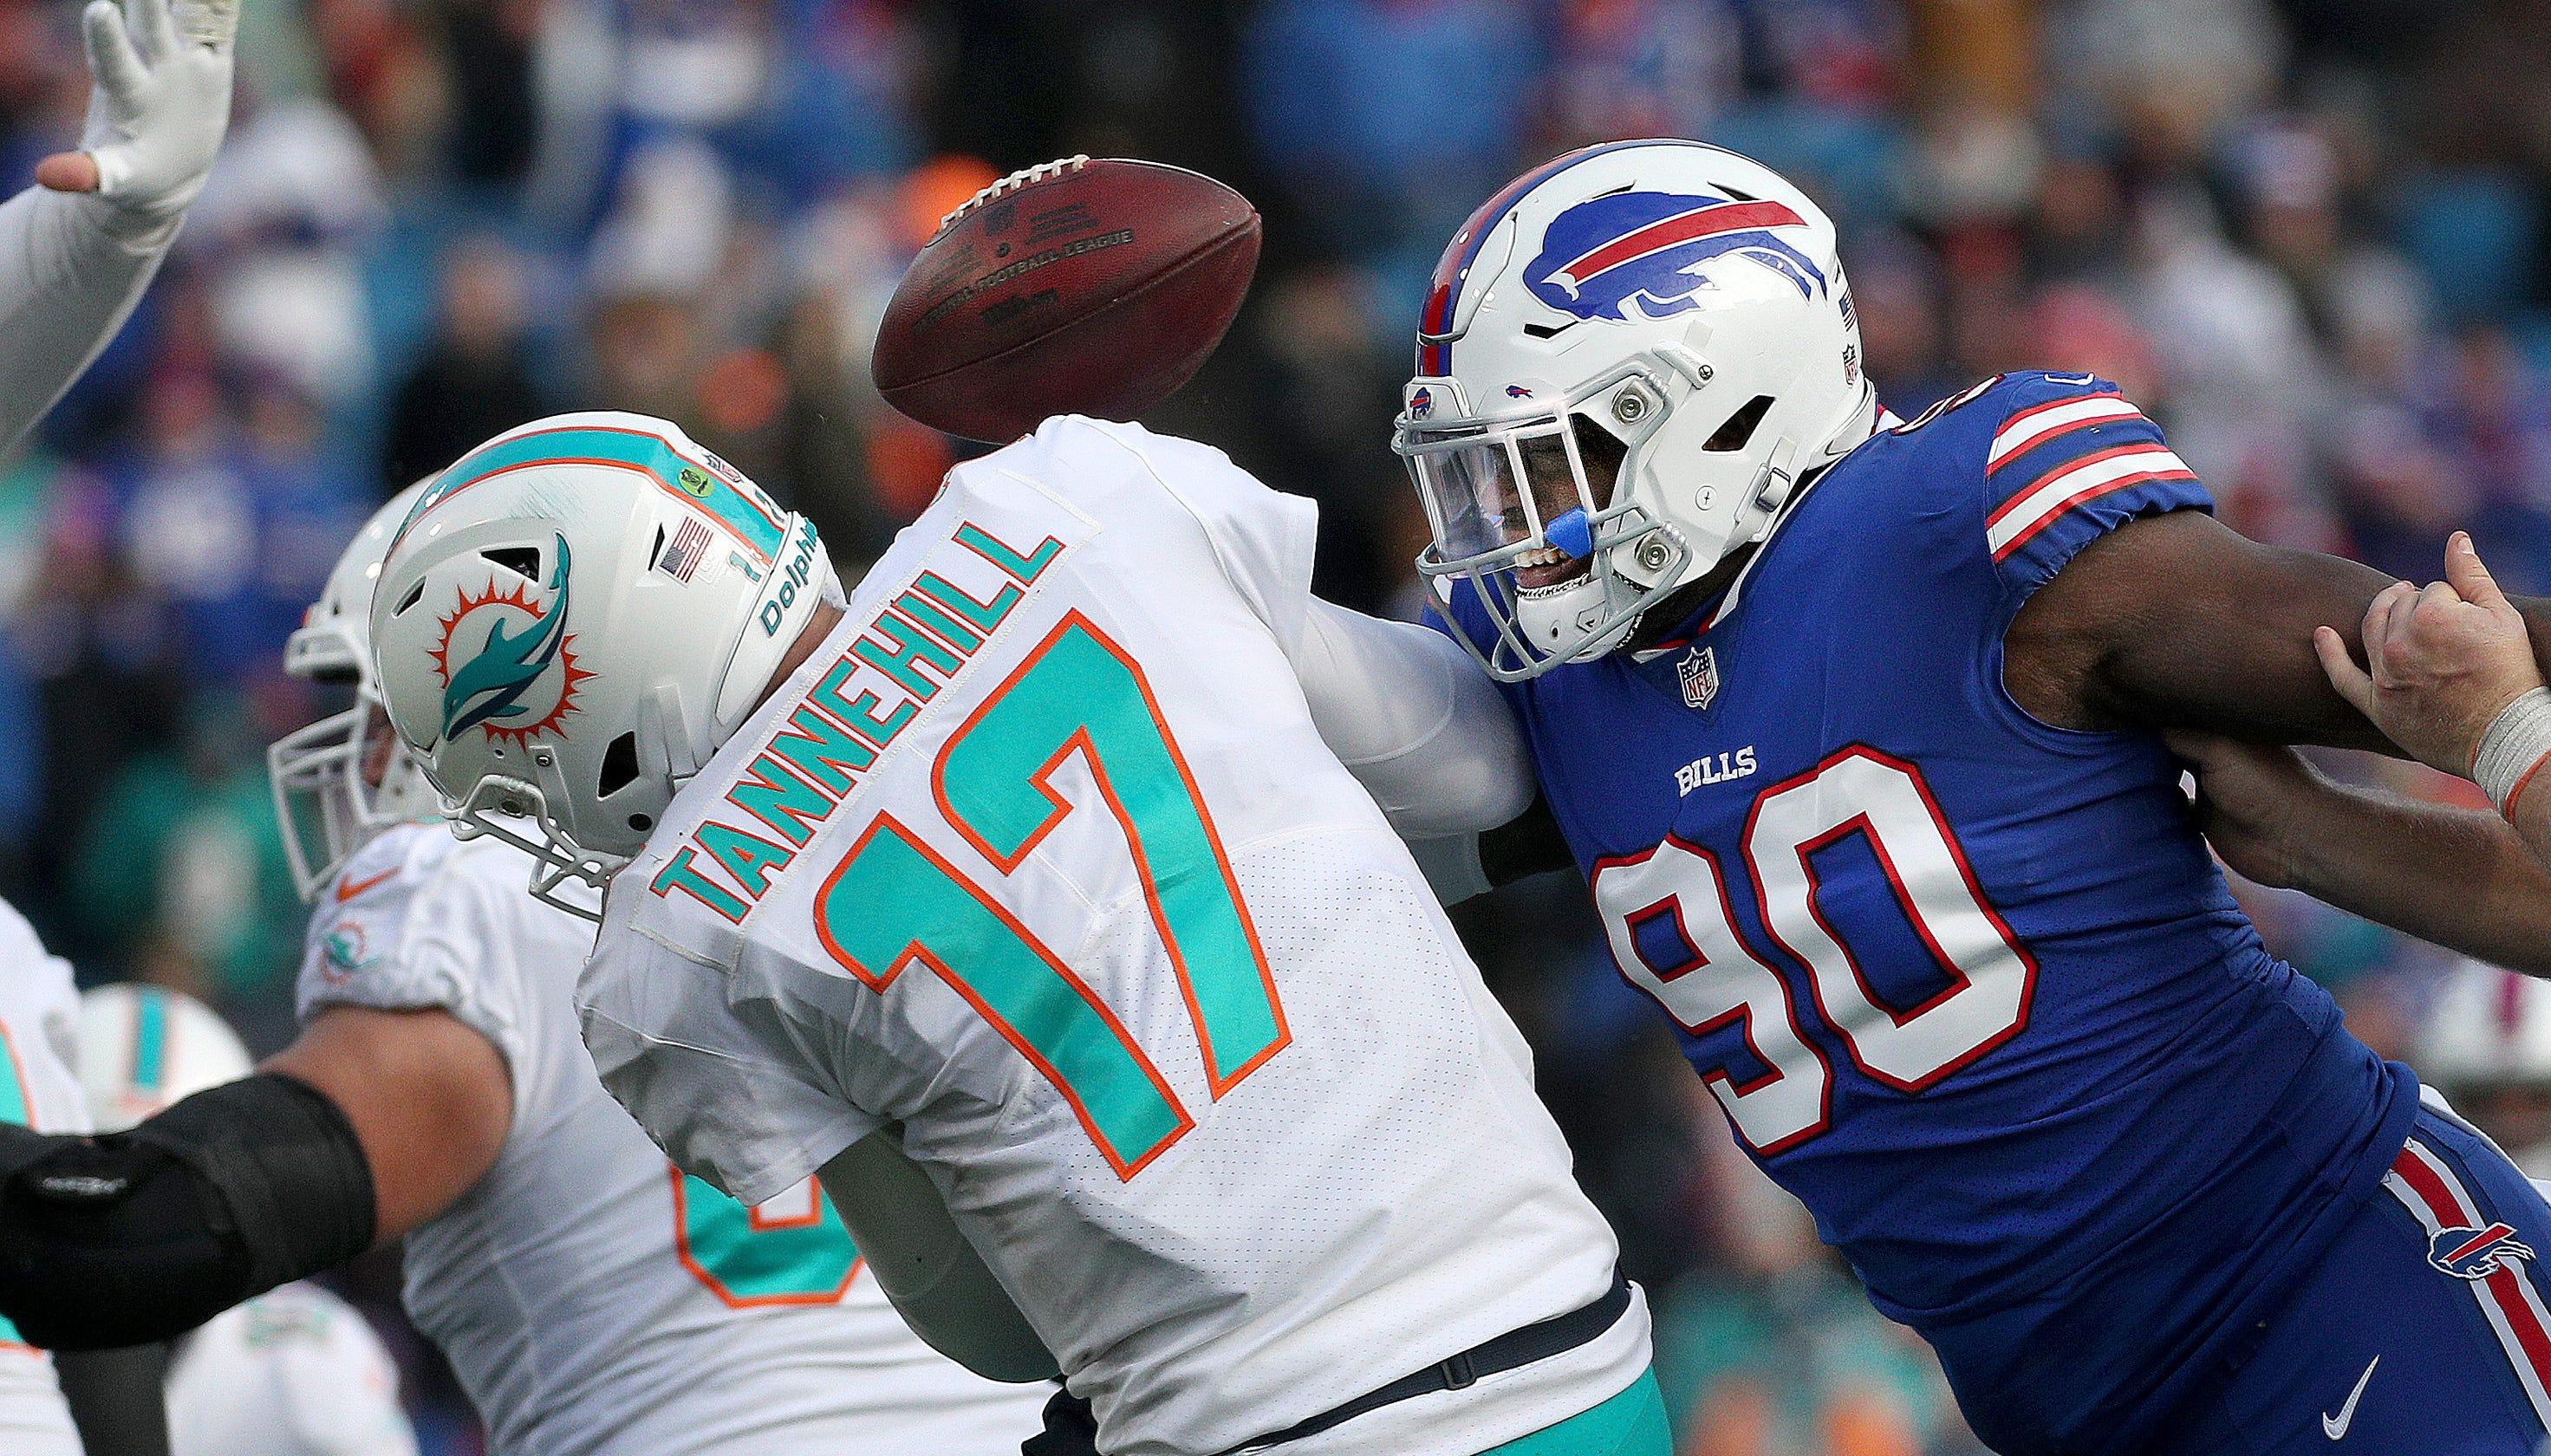 Should Buffalo Bills extend Shaq Lawson's rookie contract?